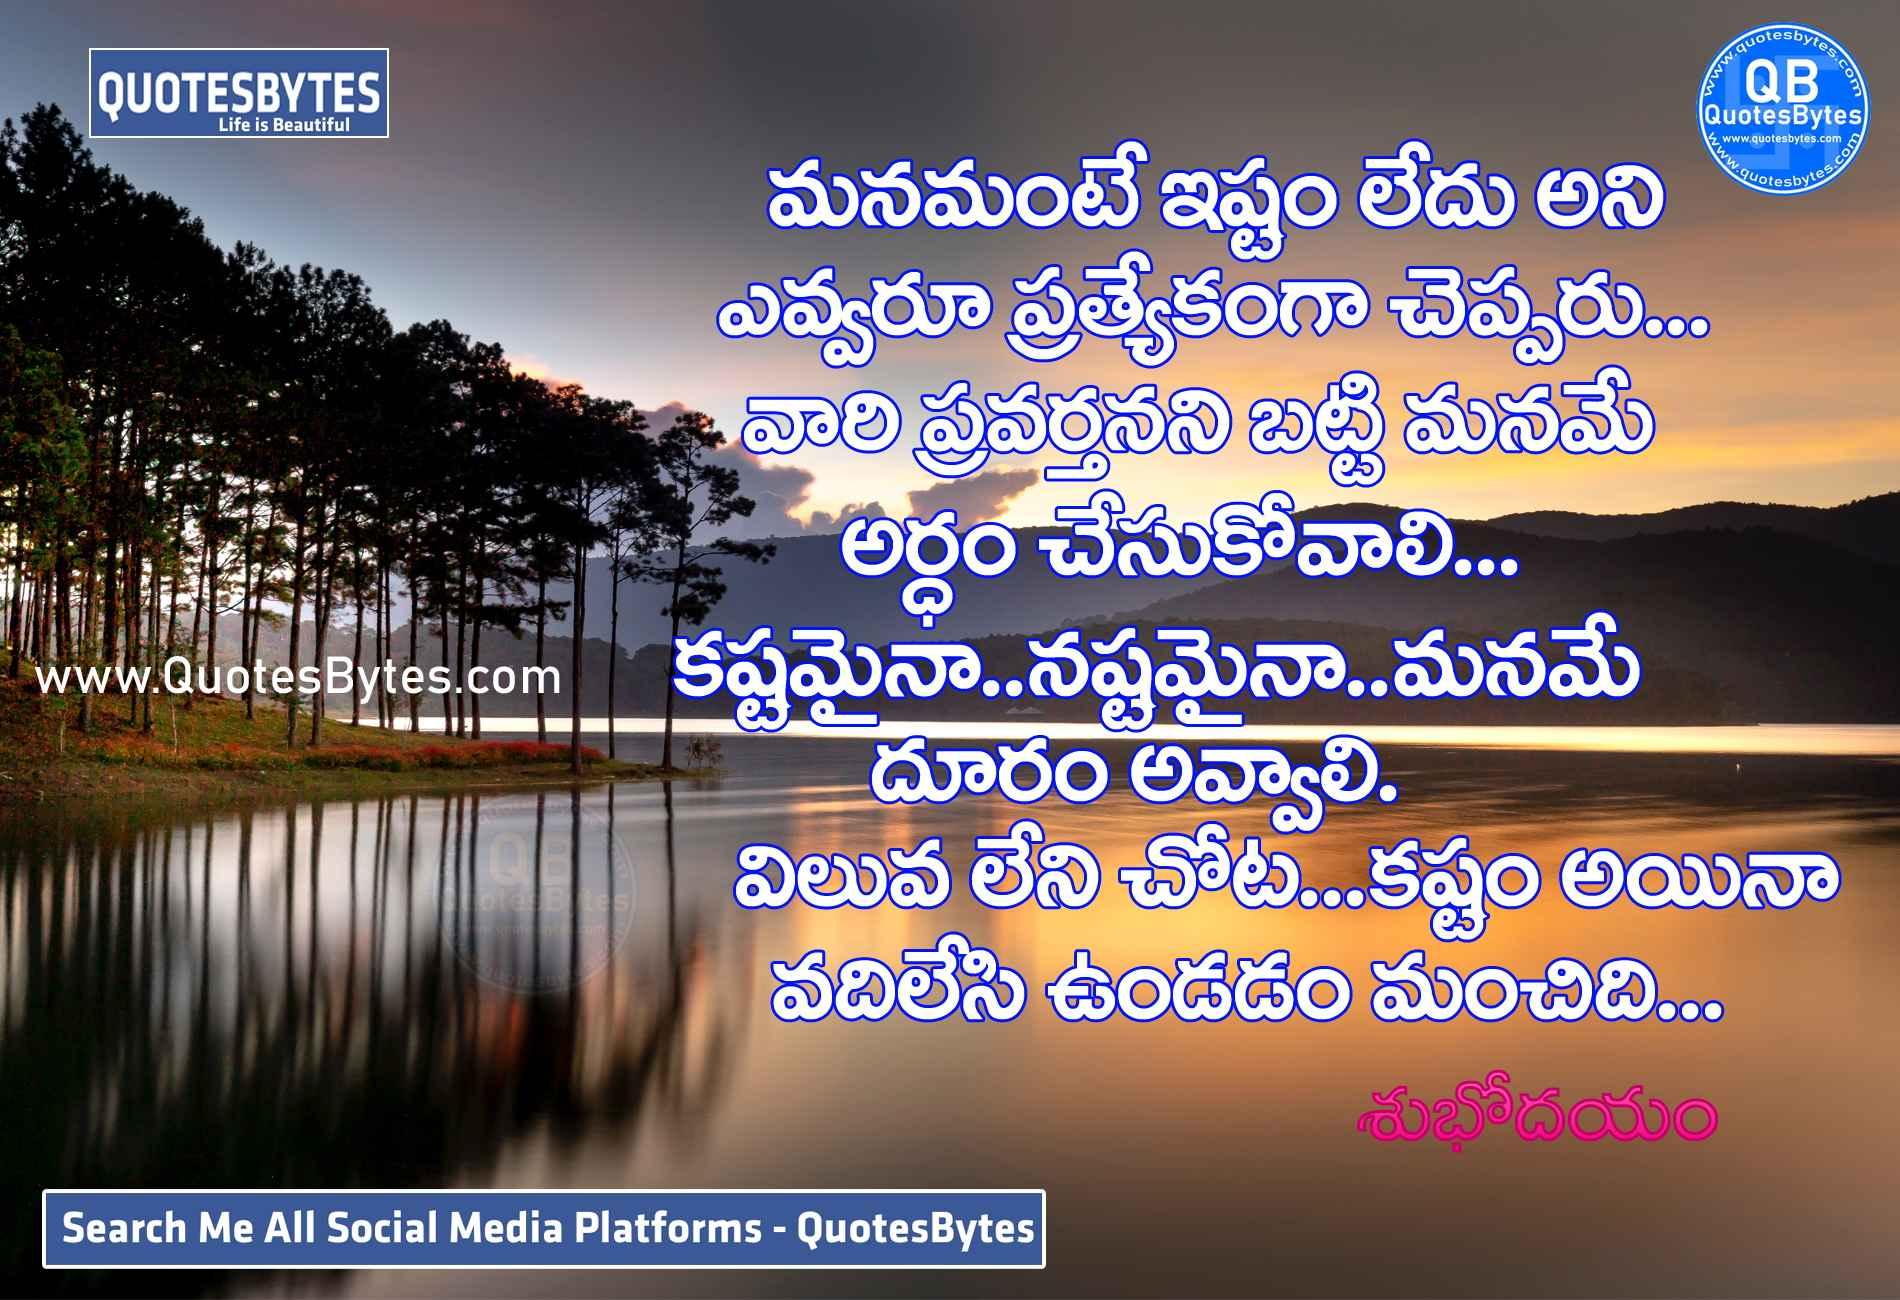 good morning images in telugu-best good morning quotes in Telugu